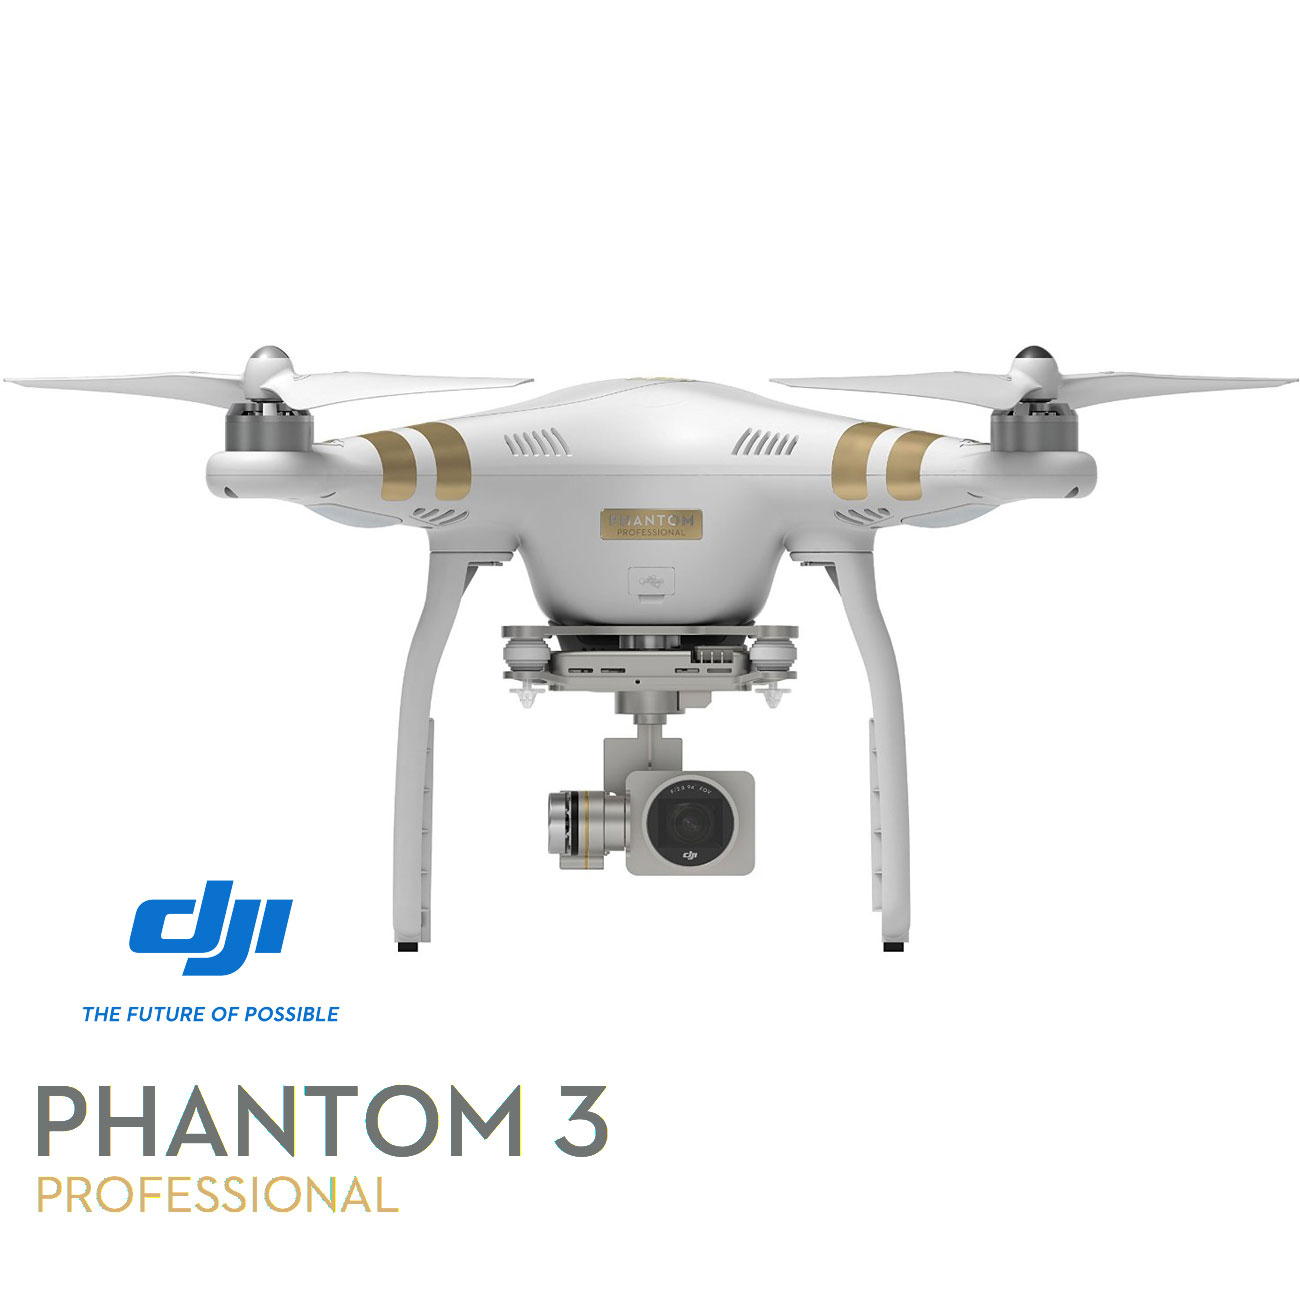 DJI Phantom 3 Professional Quadcopter 4K UHD Video Camera Drone (Certified Refurbished) by DJI